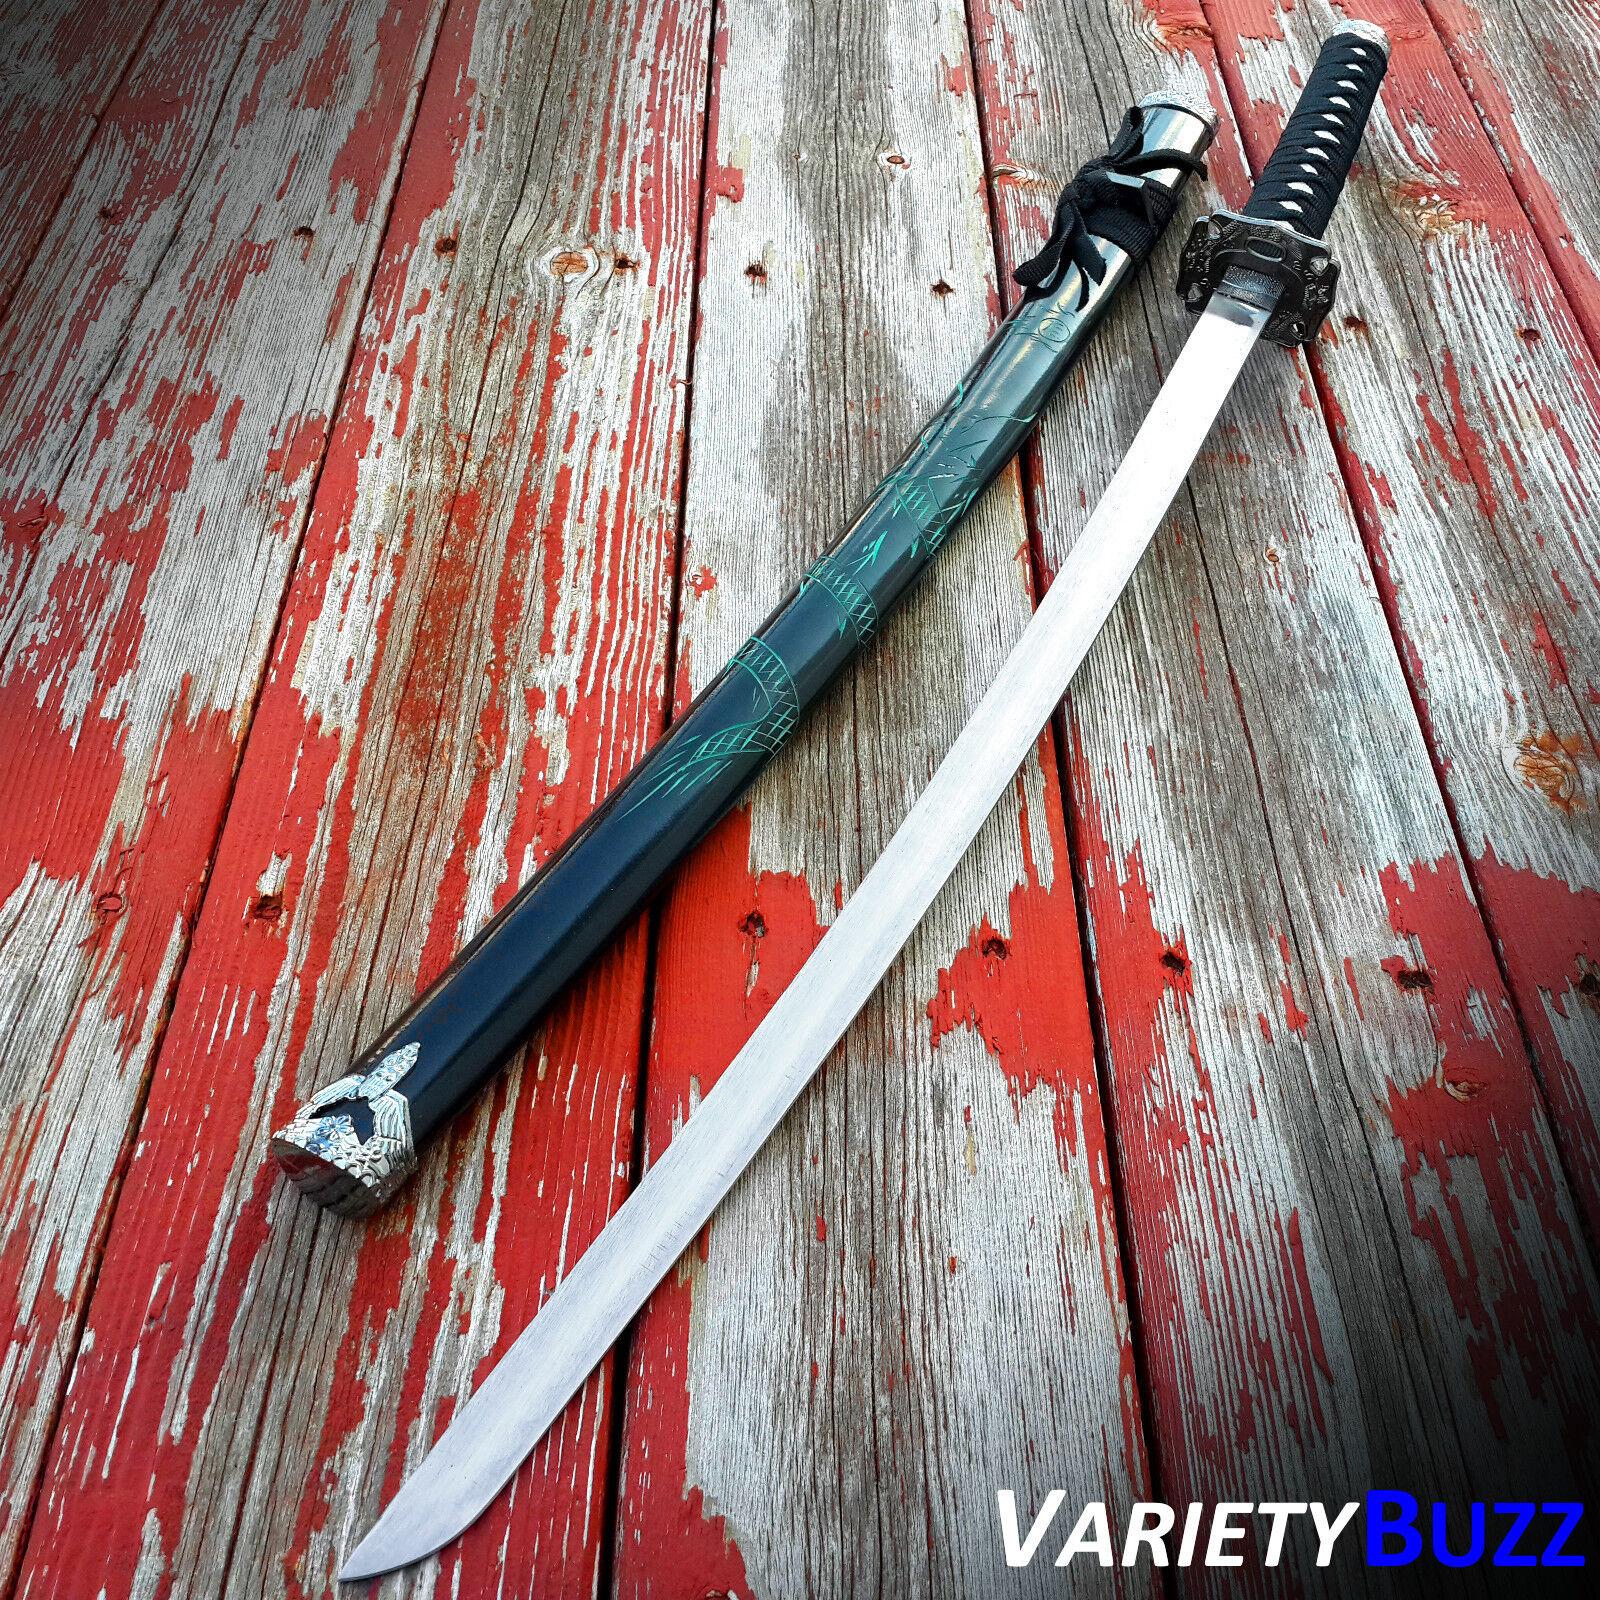 Ninjas Samurai Swords: JAPANESE SAMURAI SWORD KATANA High Carbon Steel Ninja